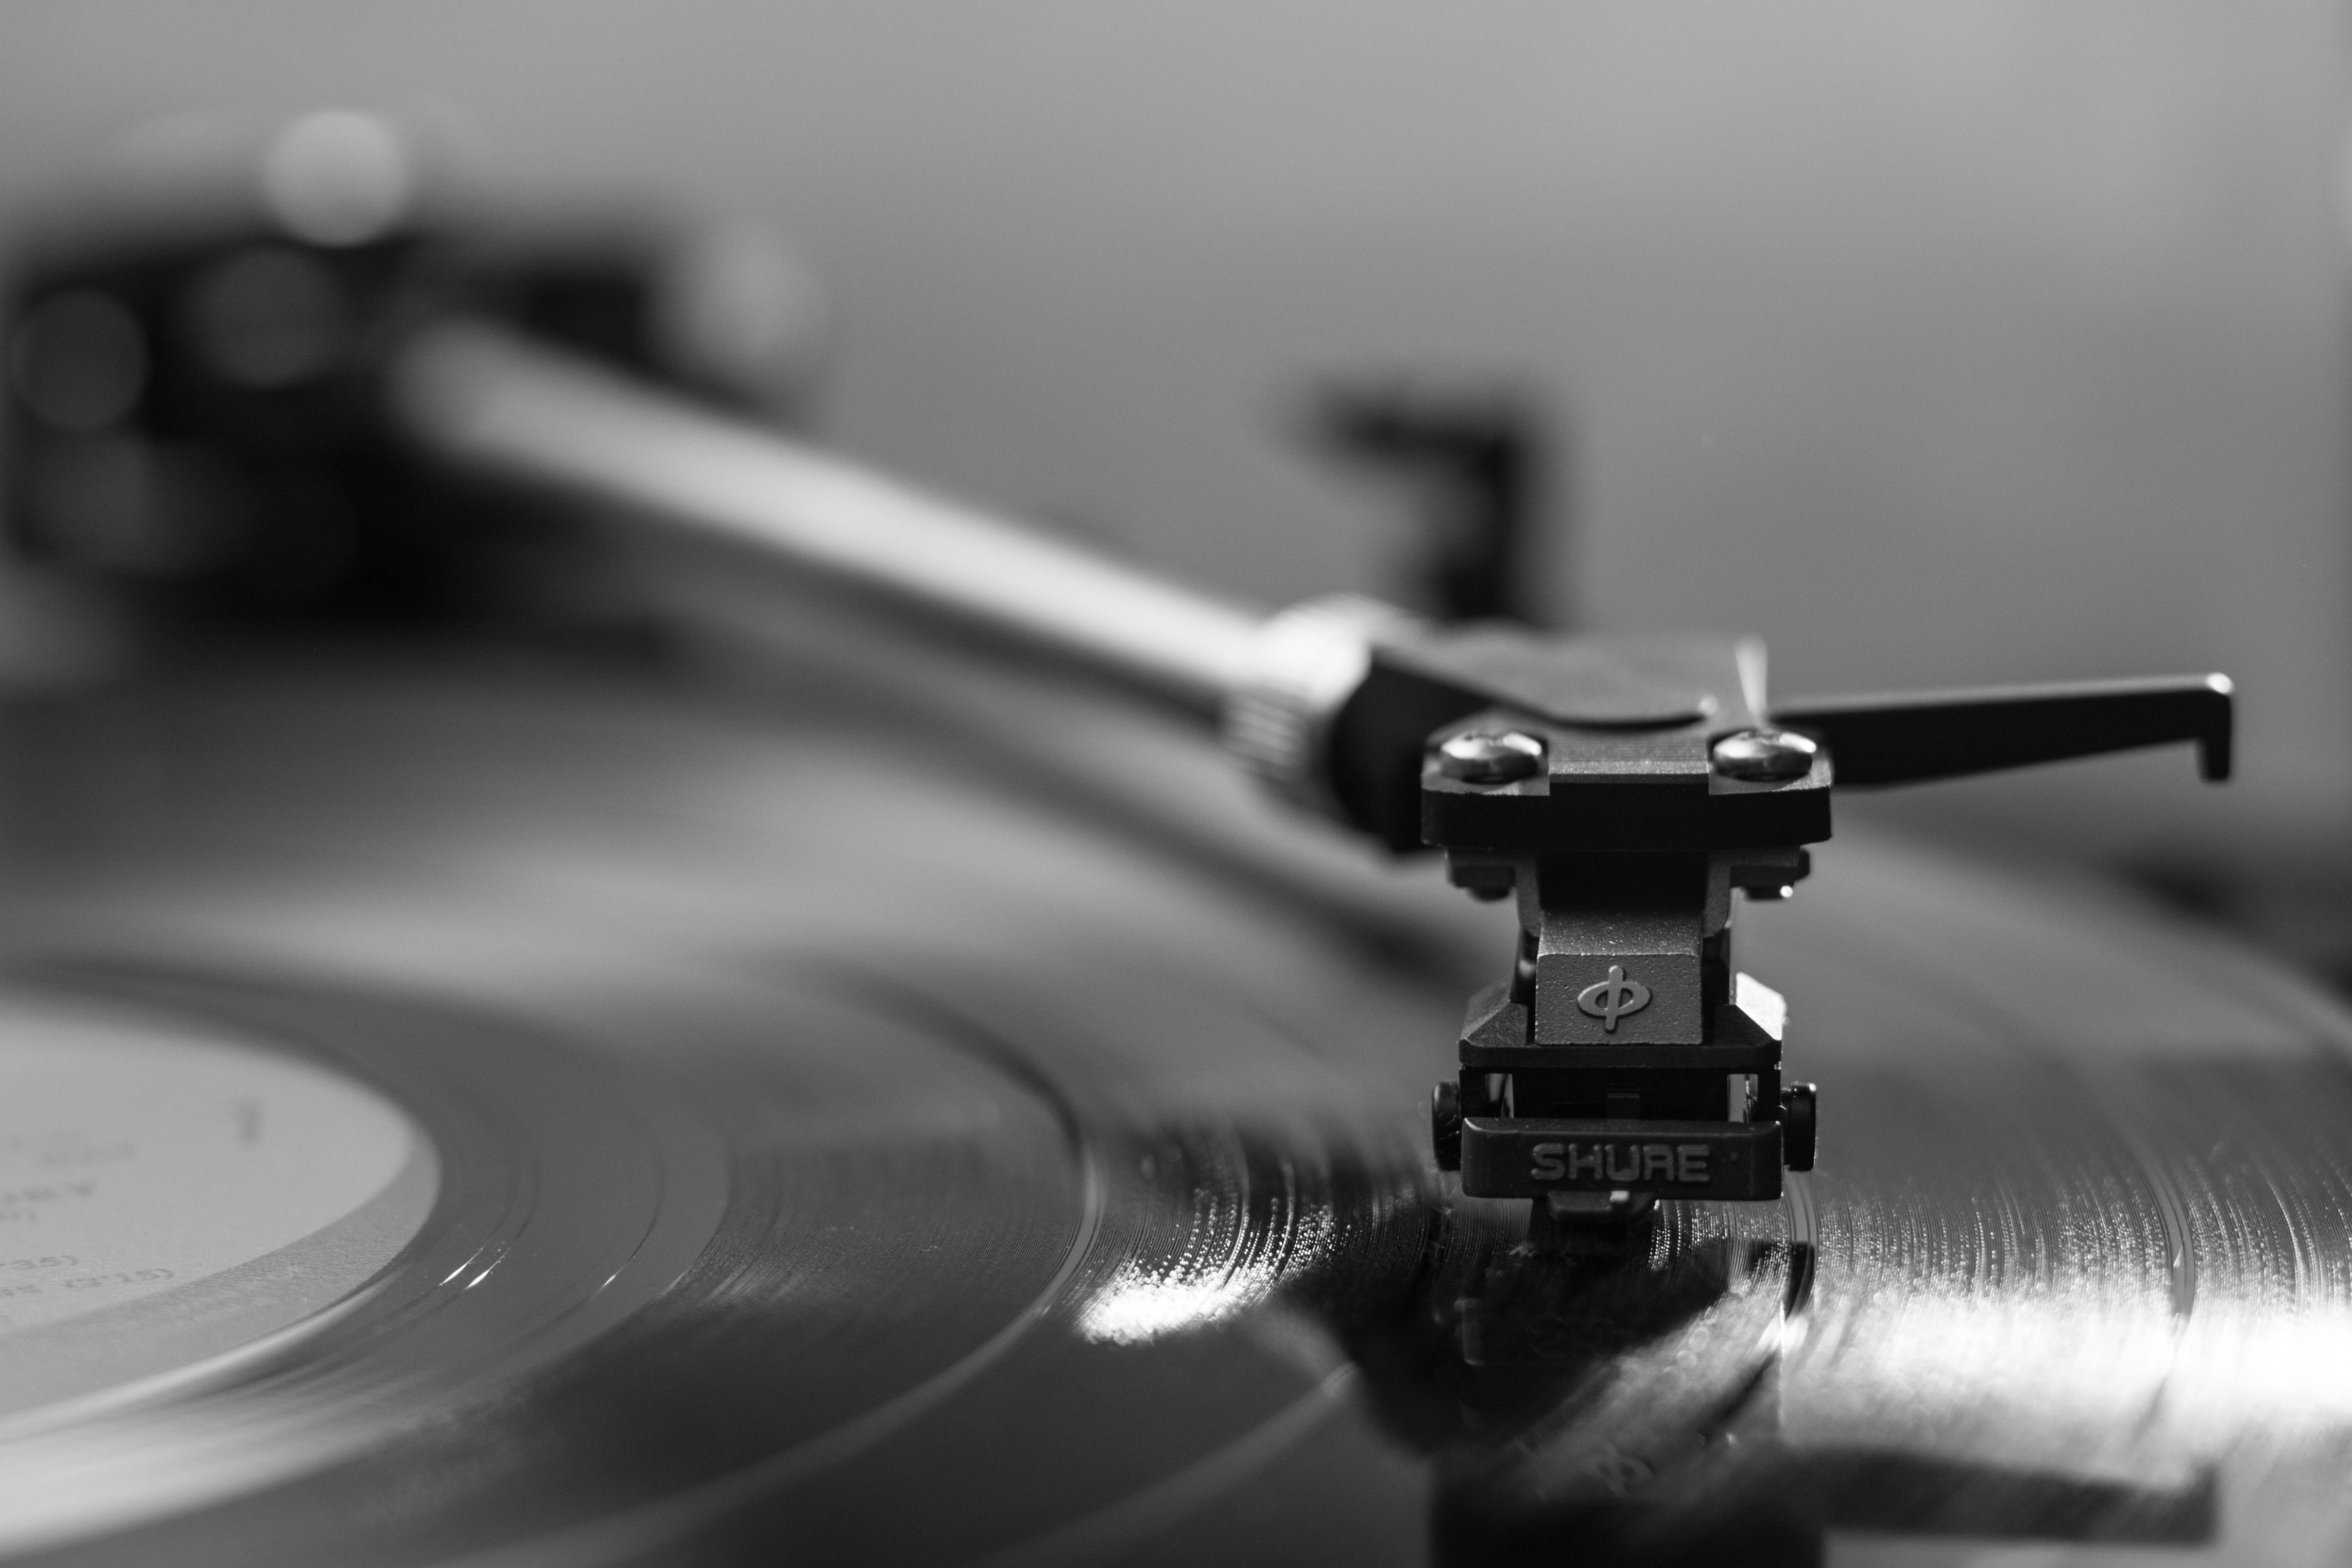 Record music vinyl turntable black and white technology photography vintage plastic reflection gadget black monochrome stylus